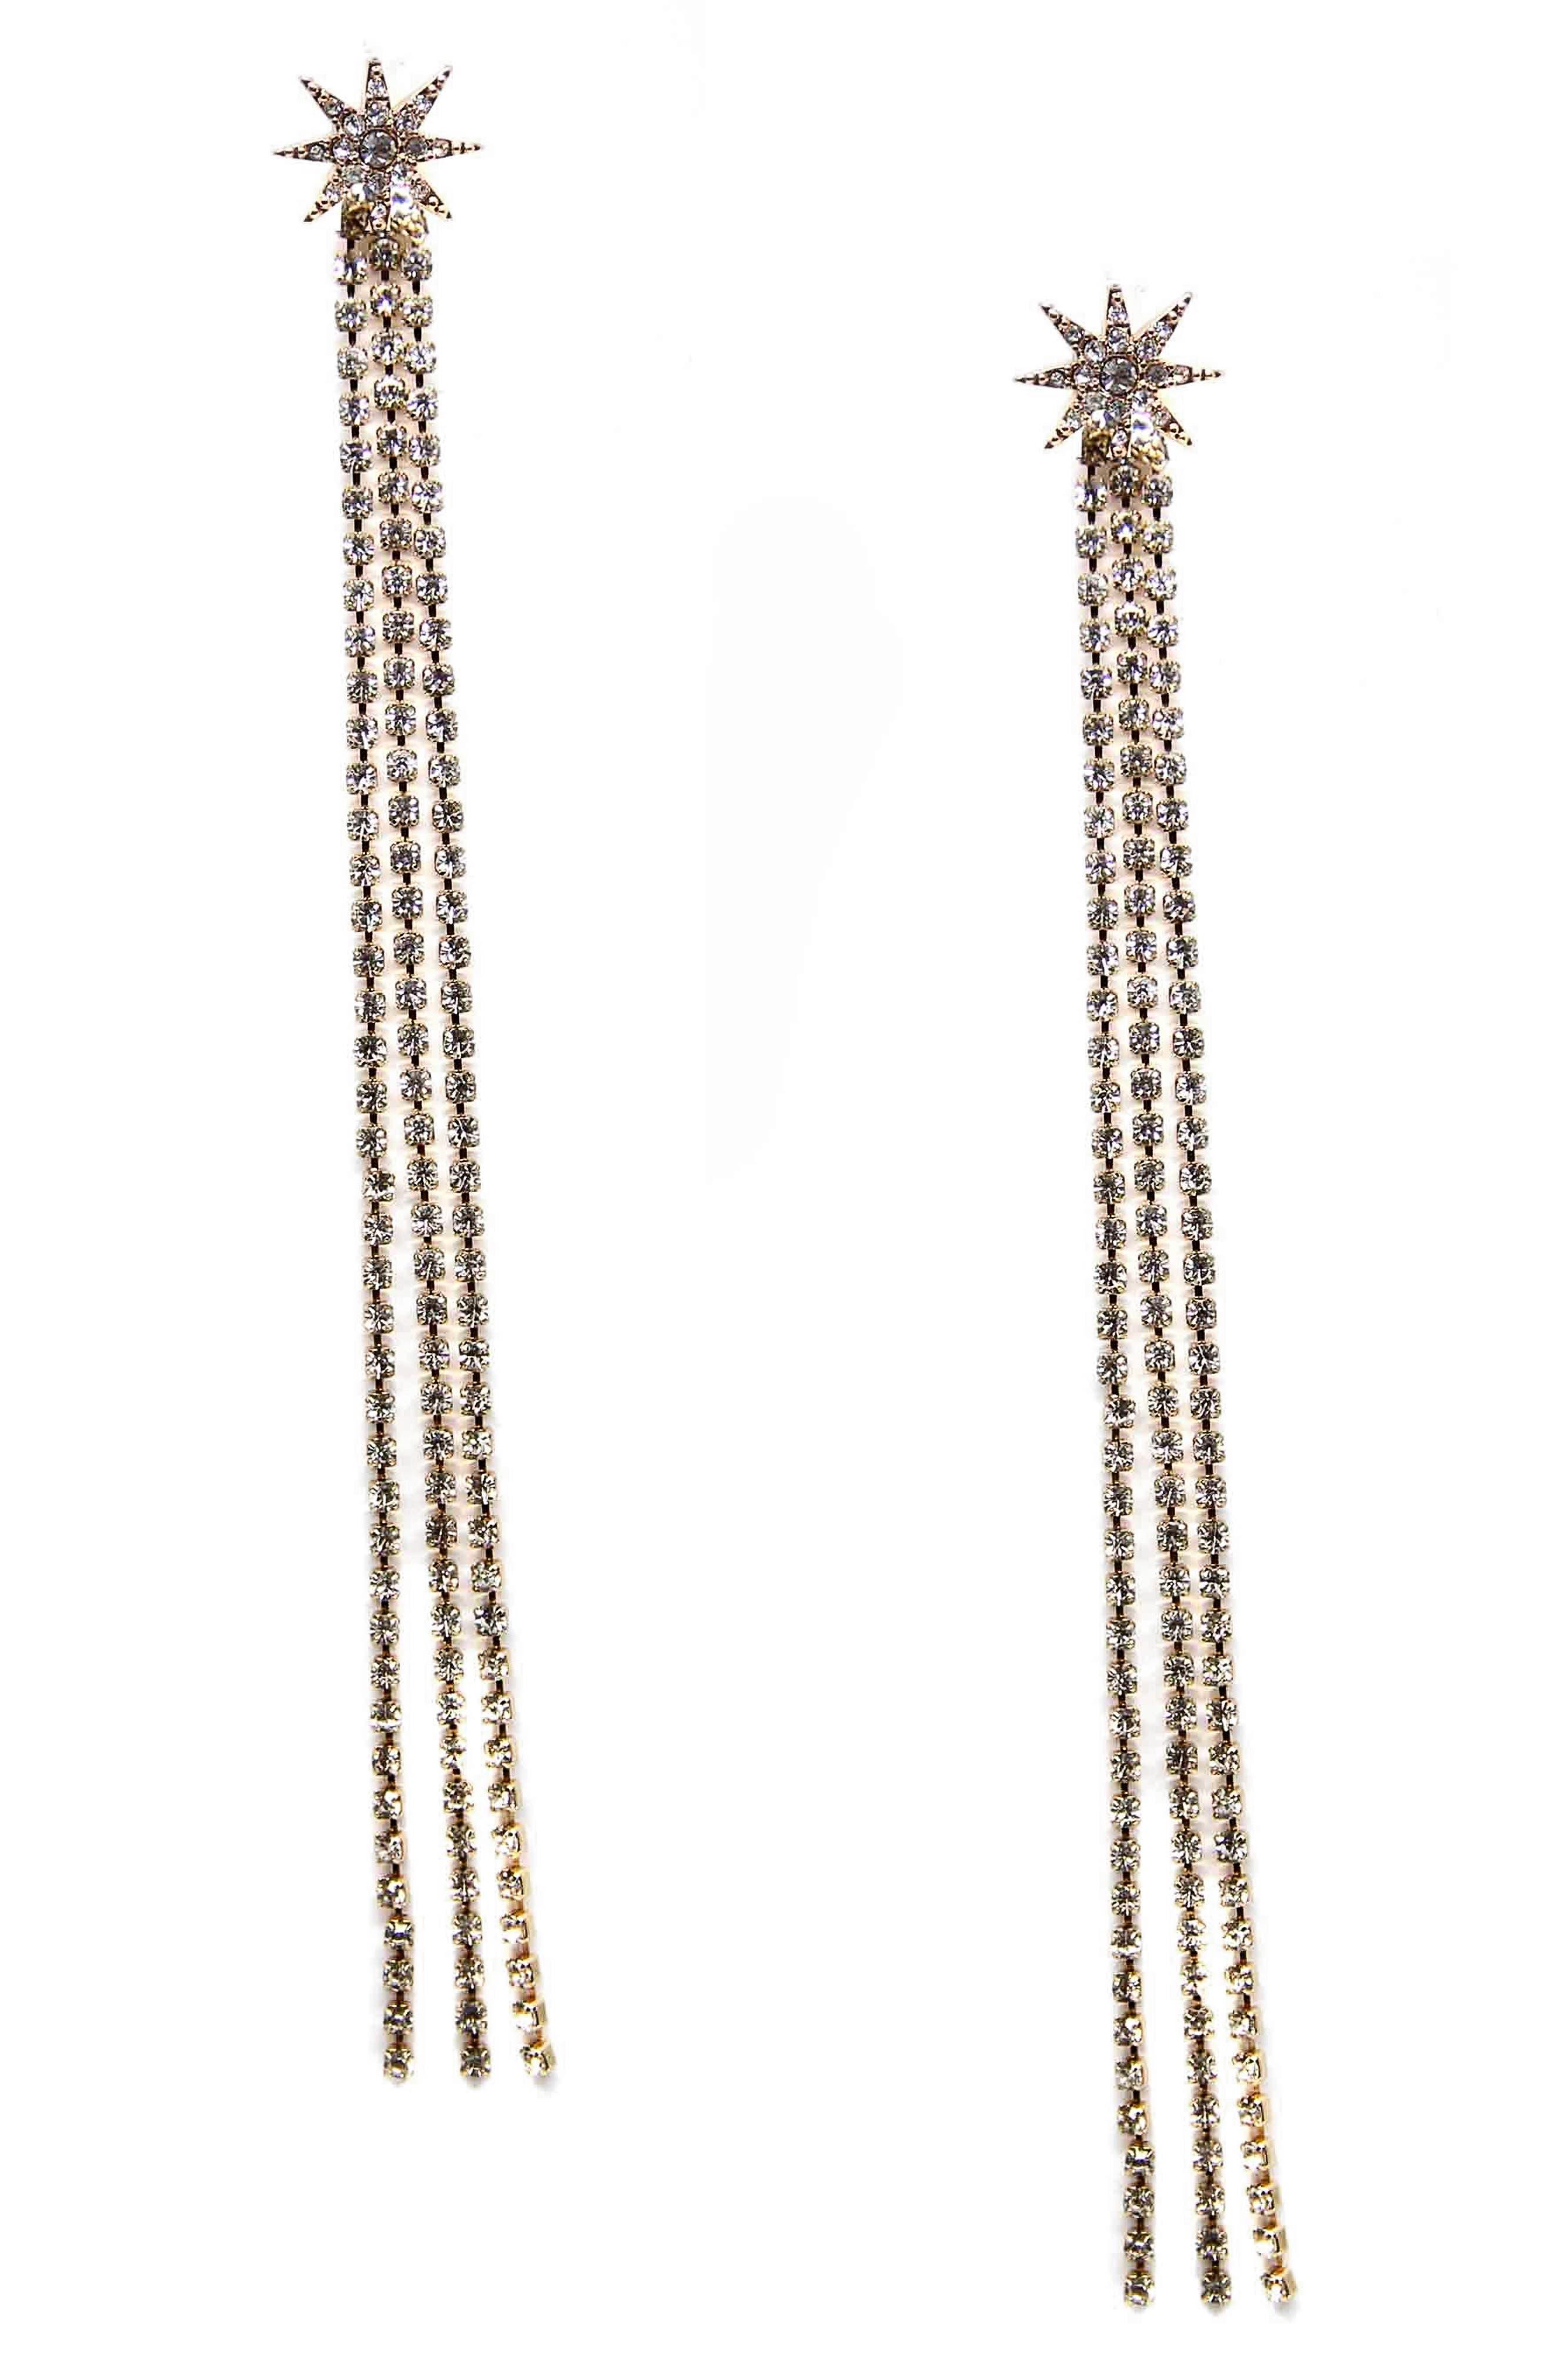 Alternate Image 1 Selected - Ettika Crystal Chain Drop Earrings